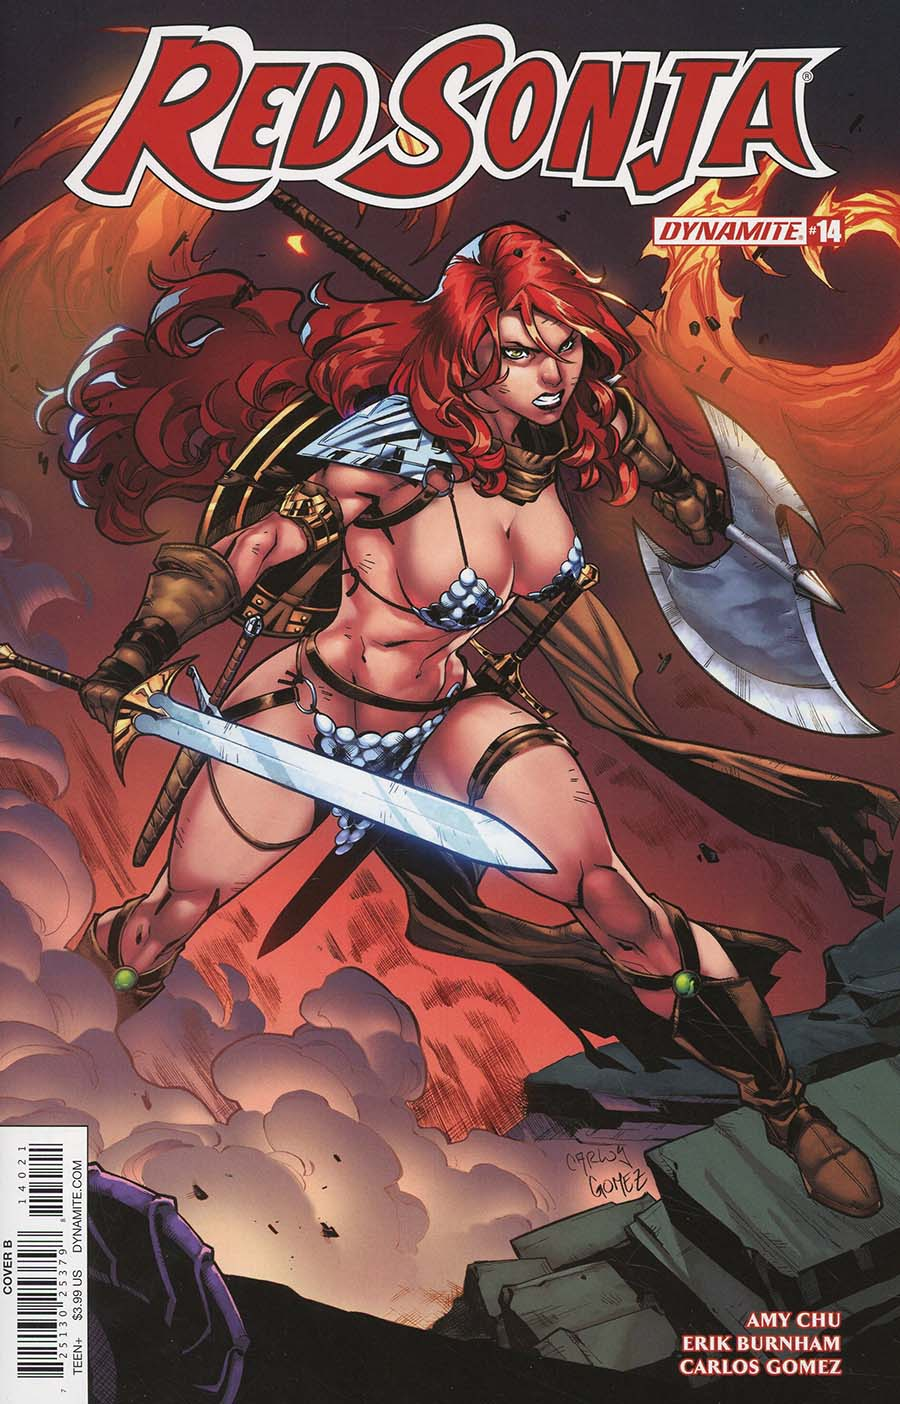 Red Sonja Vol 7 #14 Cover B Variant Carlos Gomez Cover